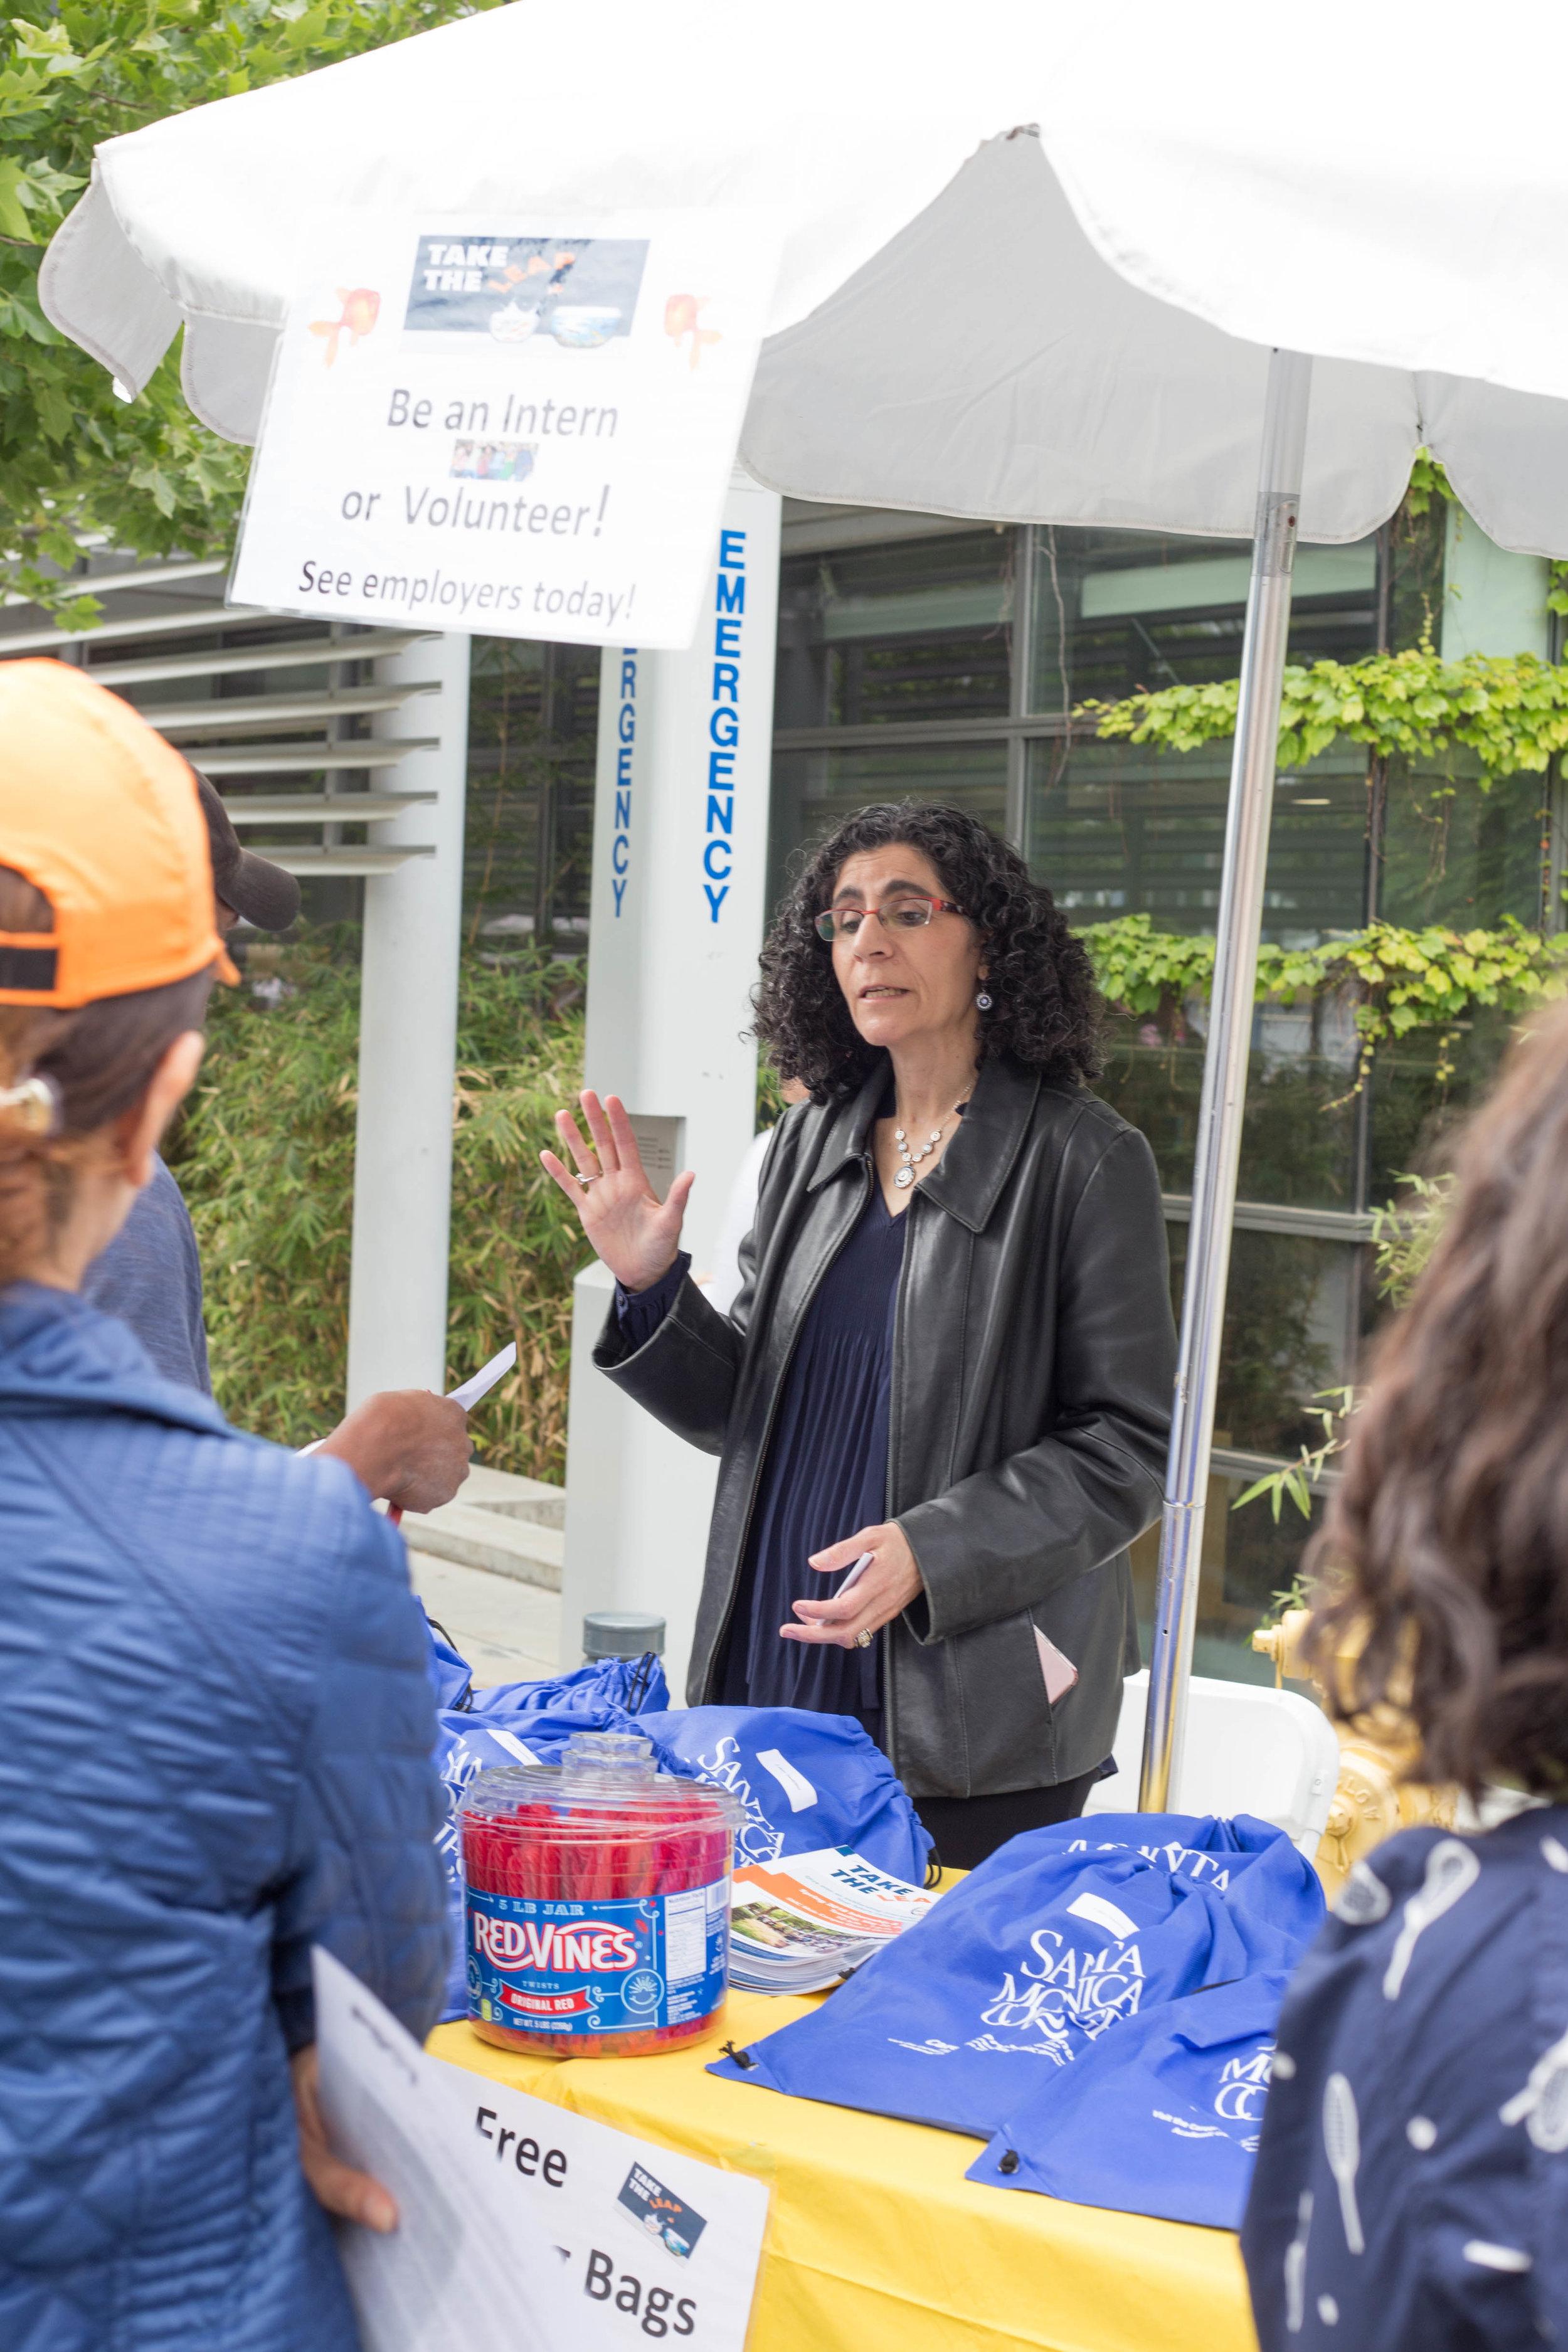 Santa Monica College (SMC) Internship Fair. SMC Internship program Vicki Rothman. SMC main campus. SMC main campus. Santa Monica, California. Tuesday May 22 2018. (Fernanda Rivera/Corsair Photo)